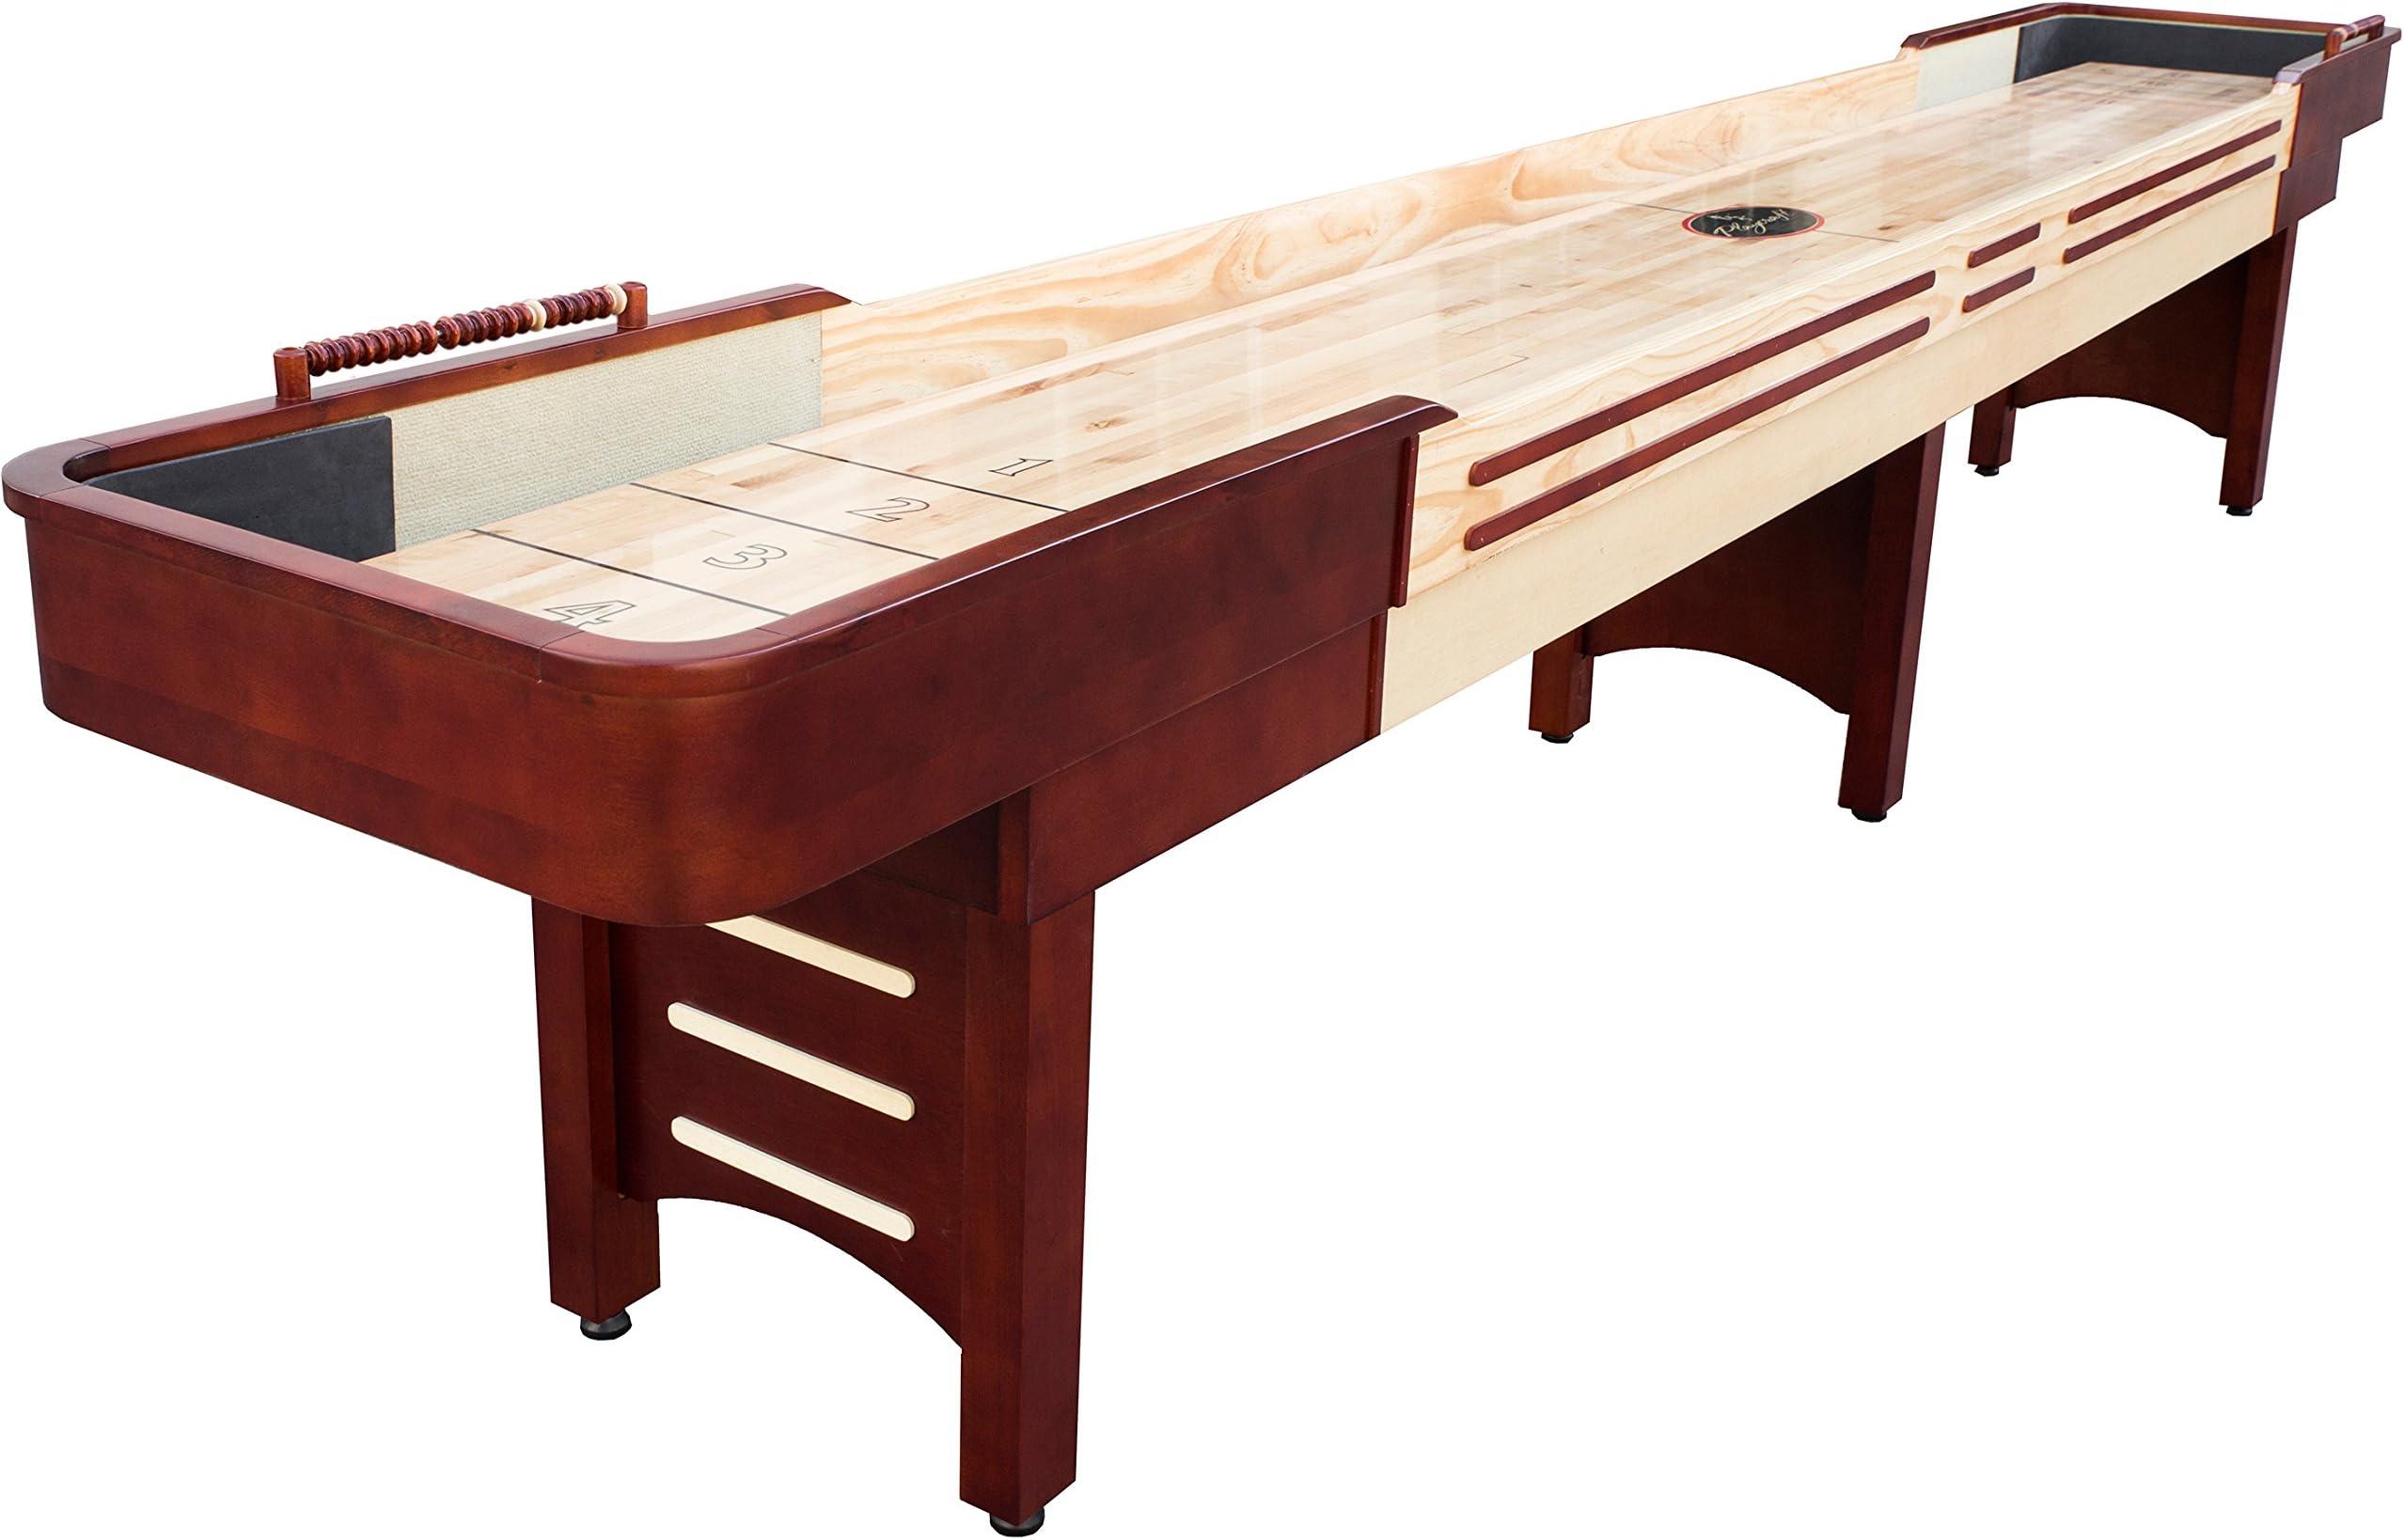 Playcraft shuffleboard table scoreboard wiring diagram modern shuffleboard amazon com tables accessories rh amazon com 12 ft playcraft shuffleboard table playcraft coventry shuffleboard keyboard keysfo Images